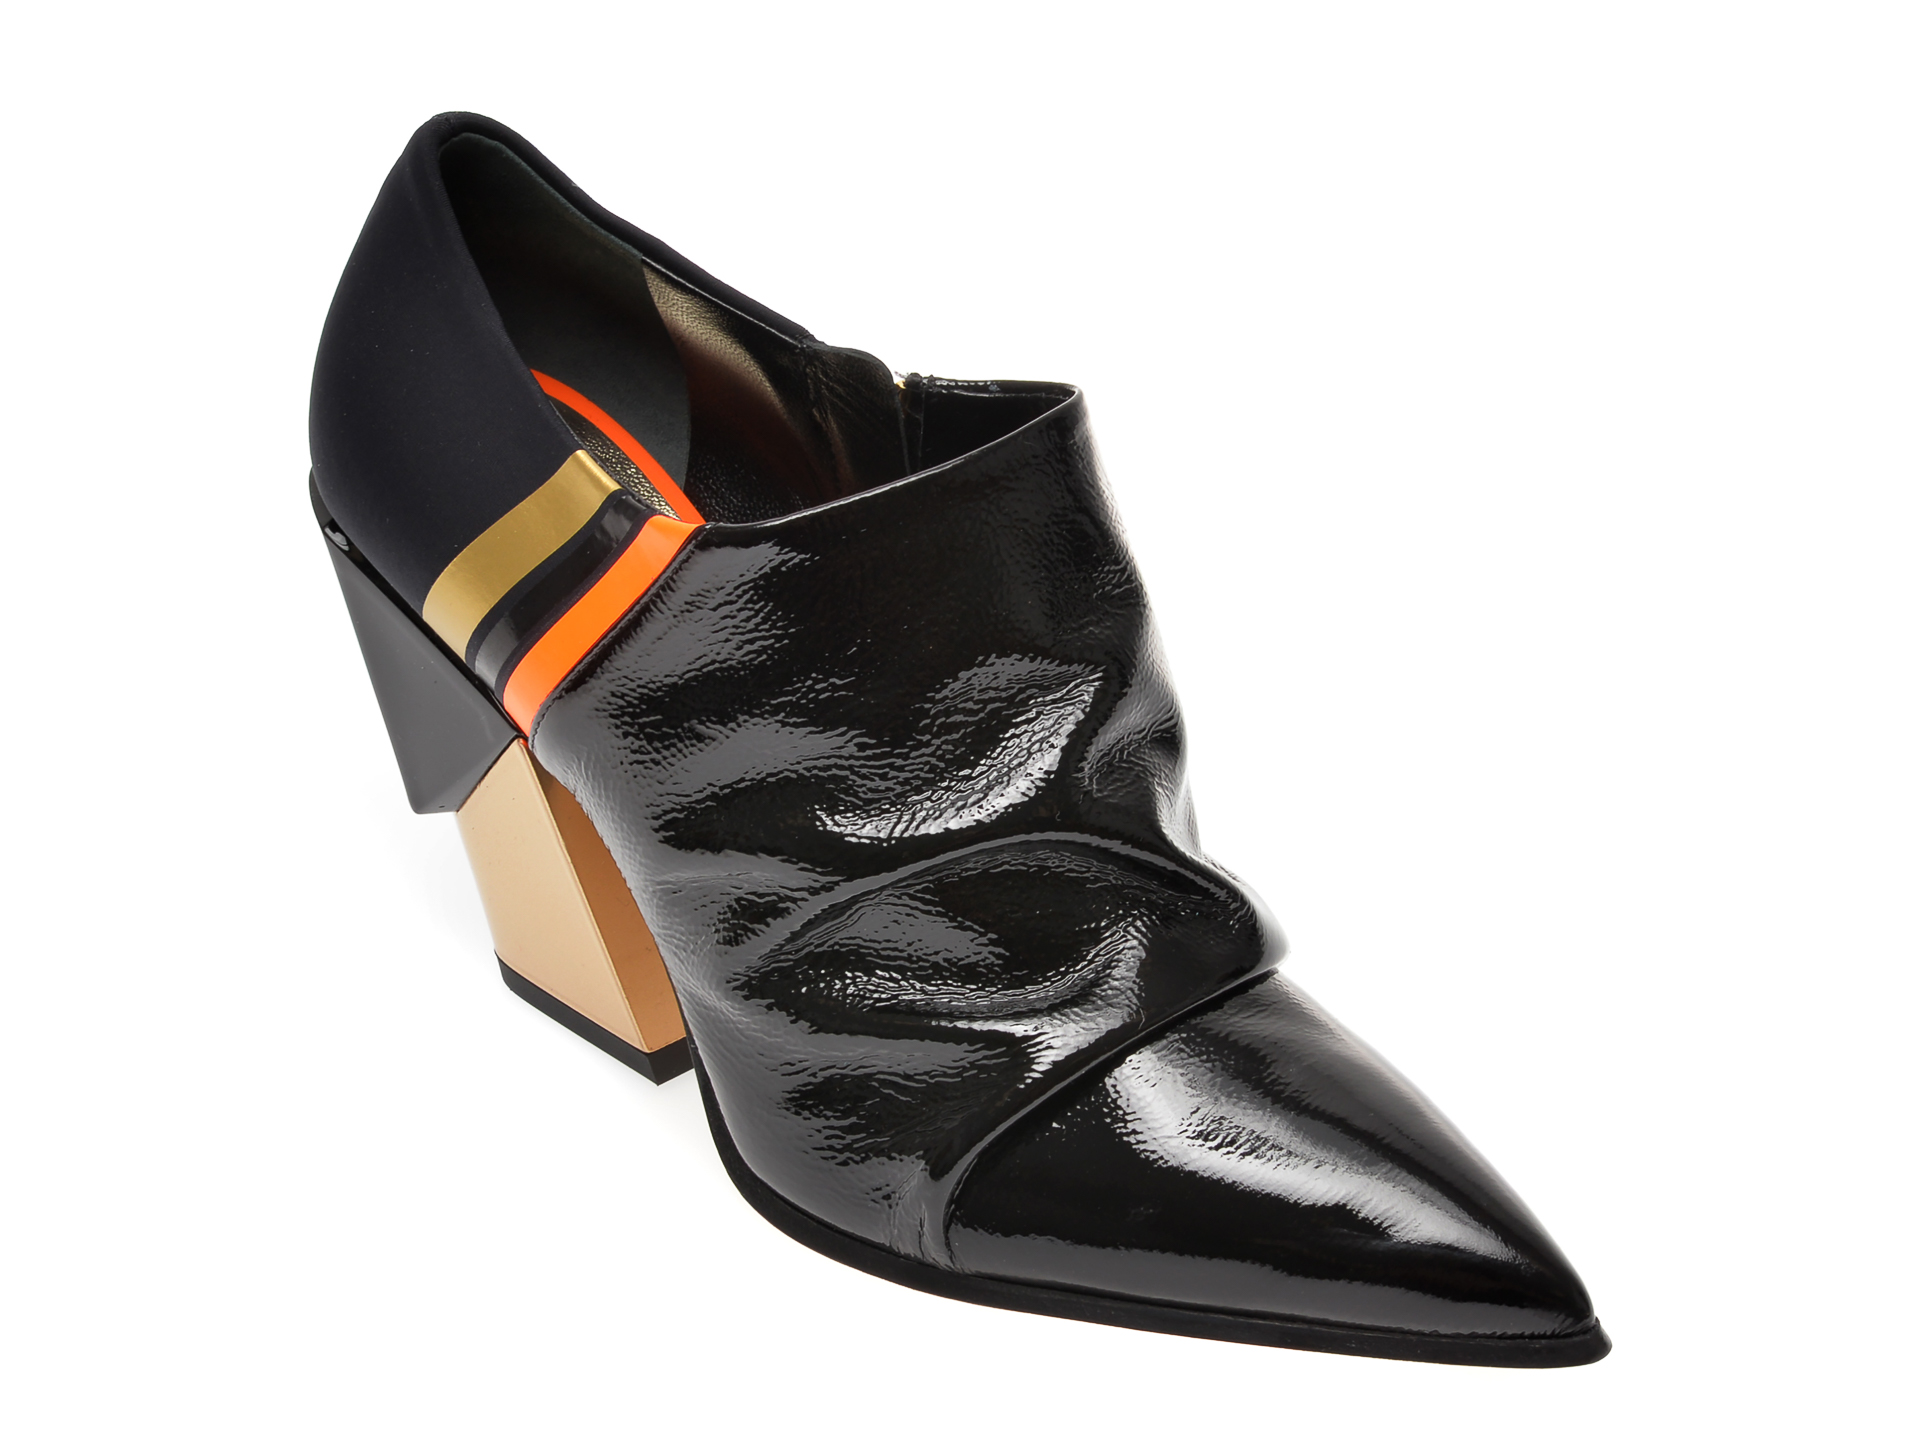 Pantofi Vara Loriblu Negri, A603, Din Piele Naturala Lacuita Si Material Textil